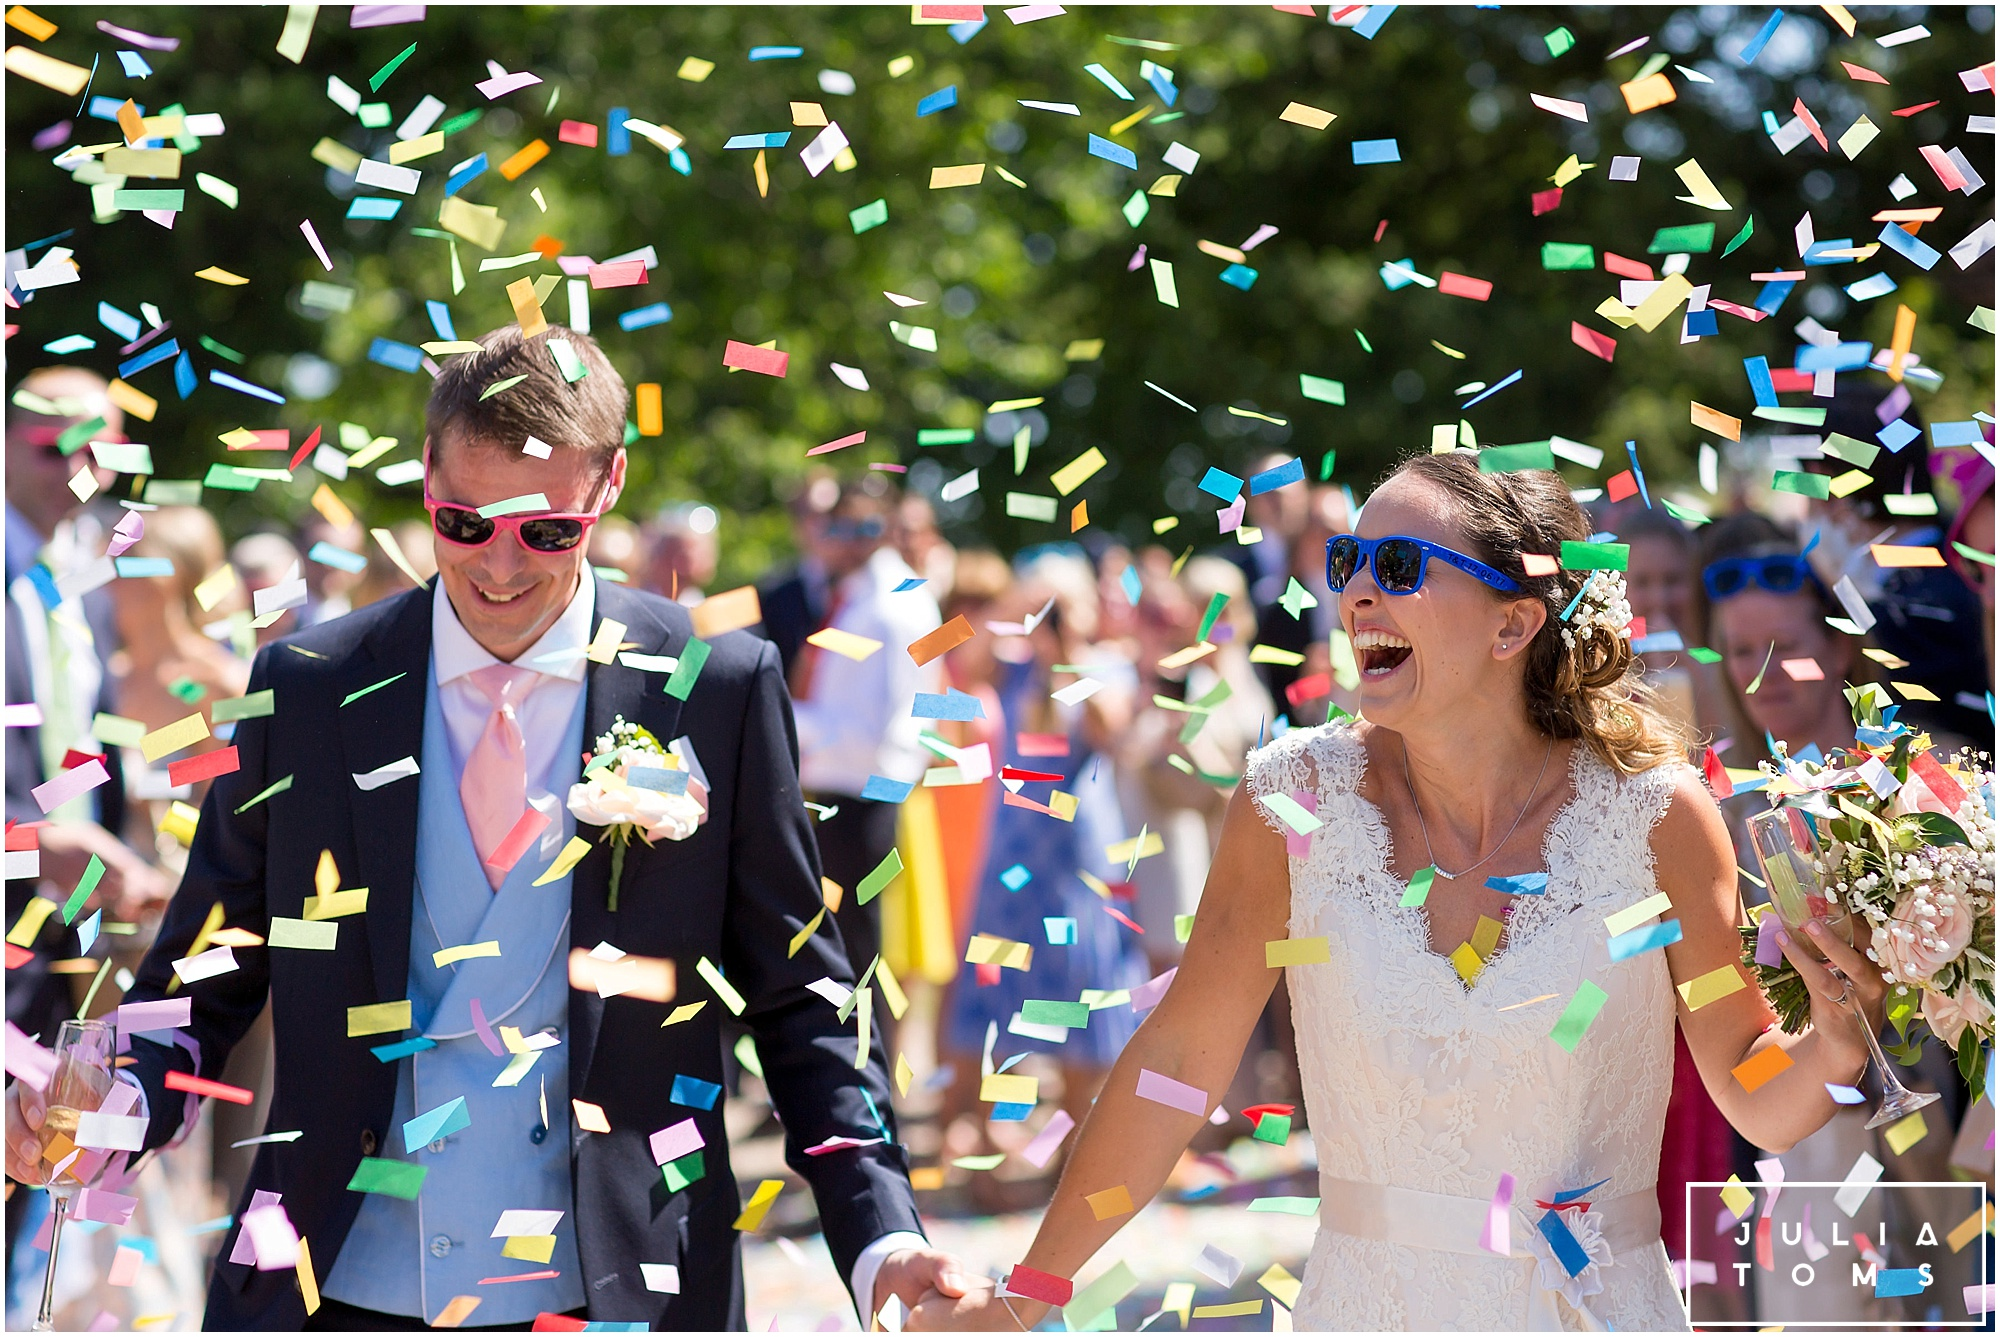 julia_toms_chichester_wedding_photographer_portsmouth_035.jpg